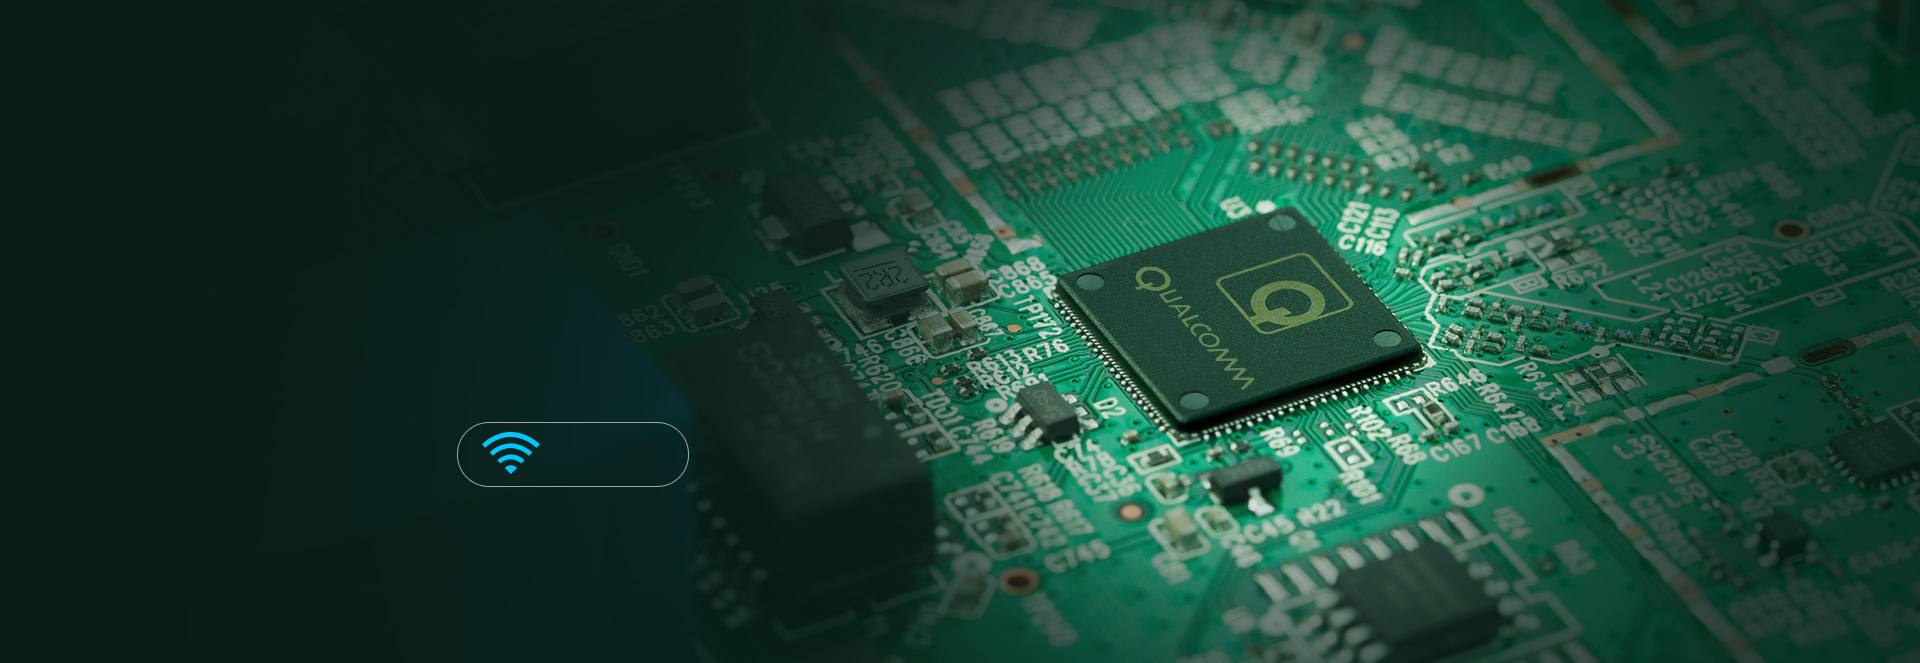 Bộ thu phát TP-Link EAP110 300Mbps, 60 User